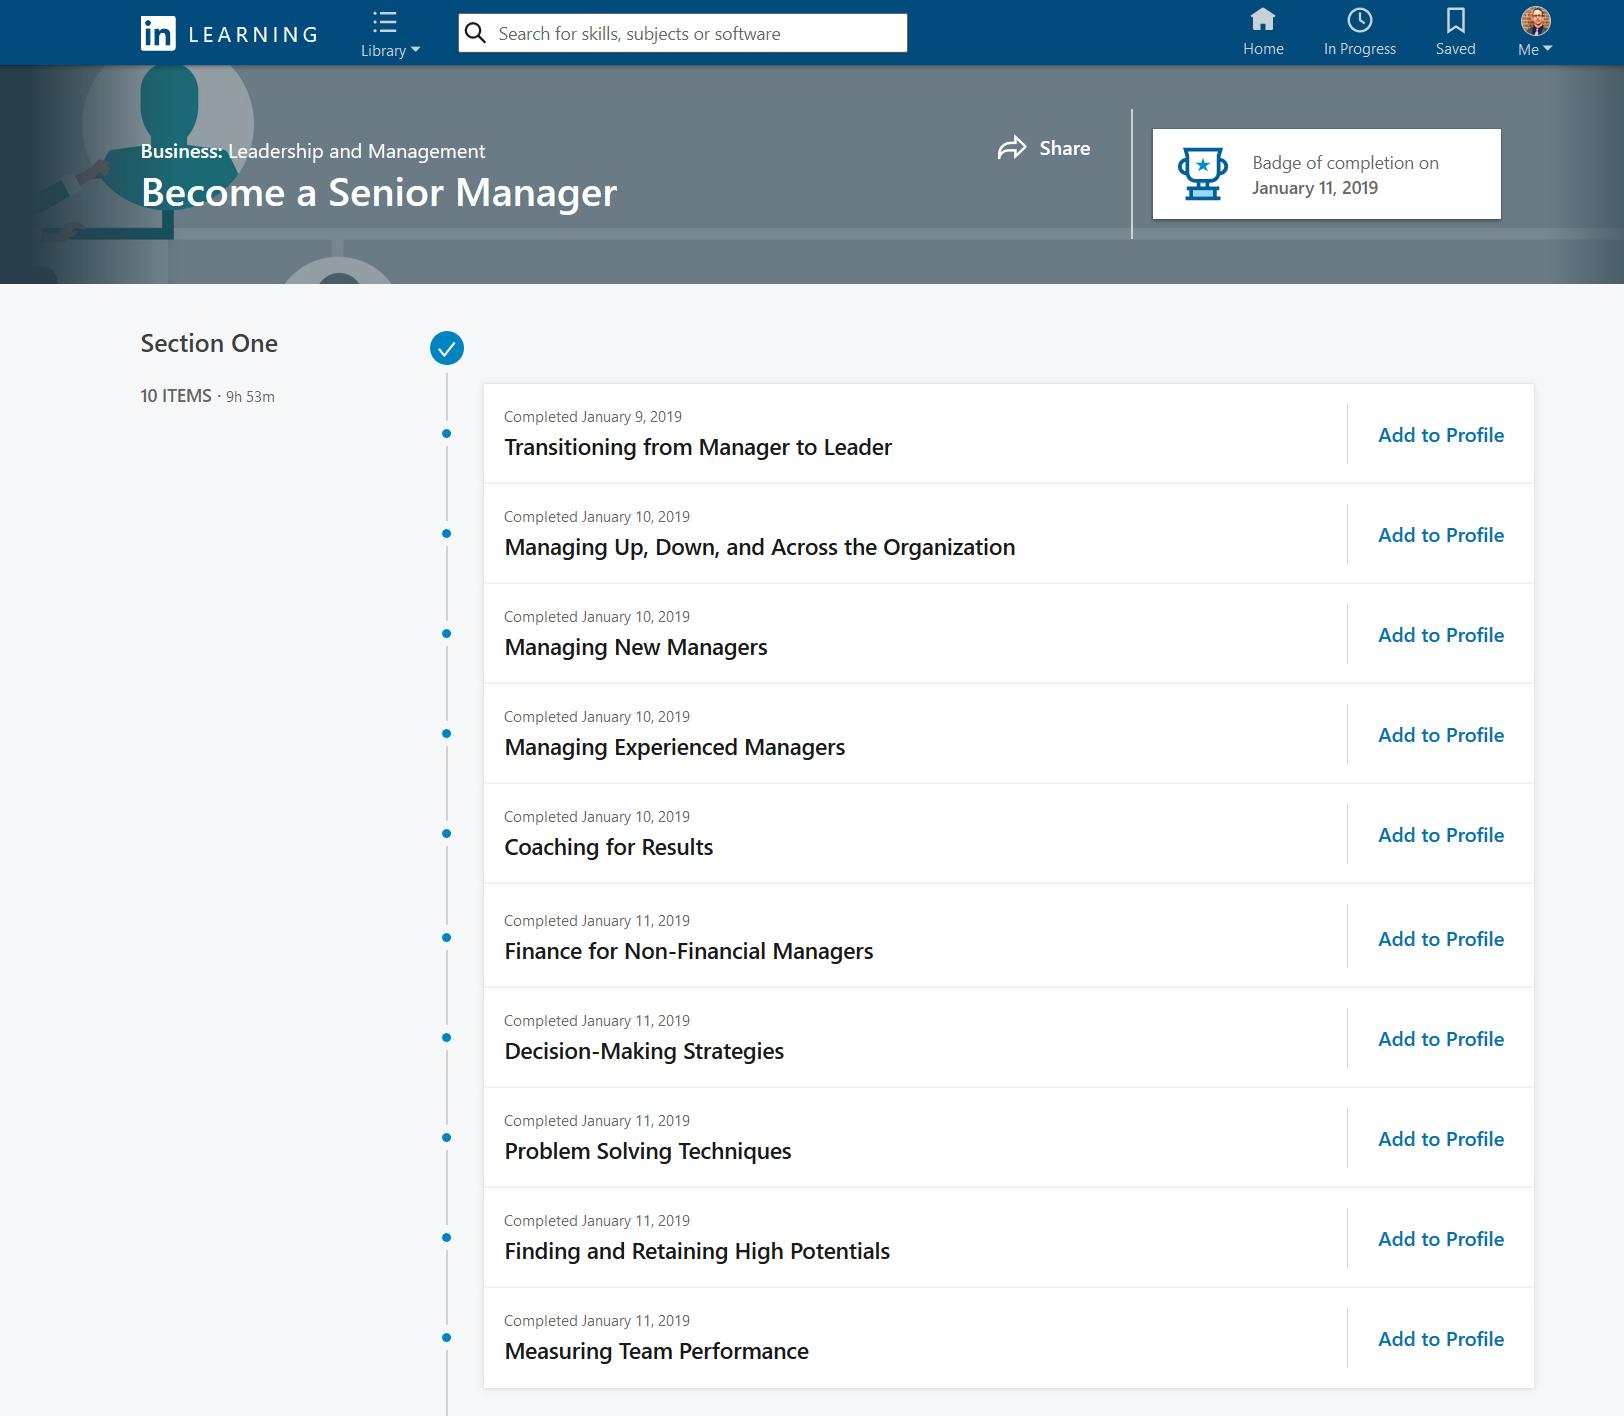 Matthew Bardeleben - Executive Leadership Senior Manager Certification - LinkedIn Learning Path